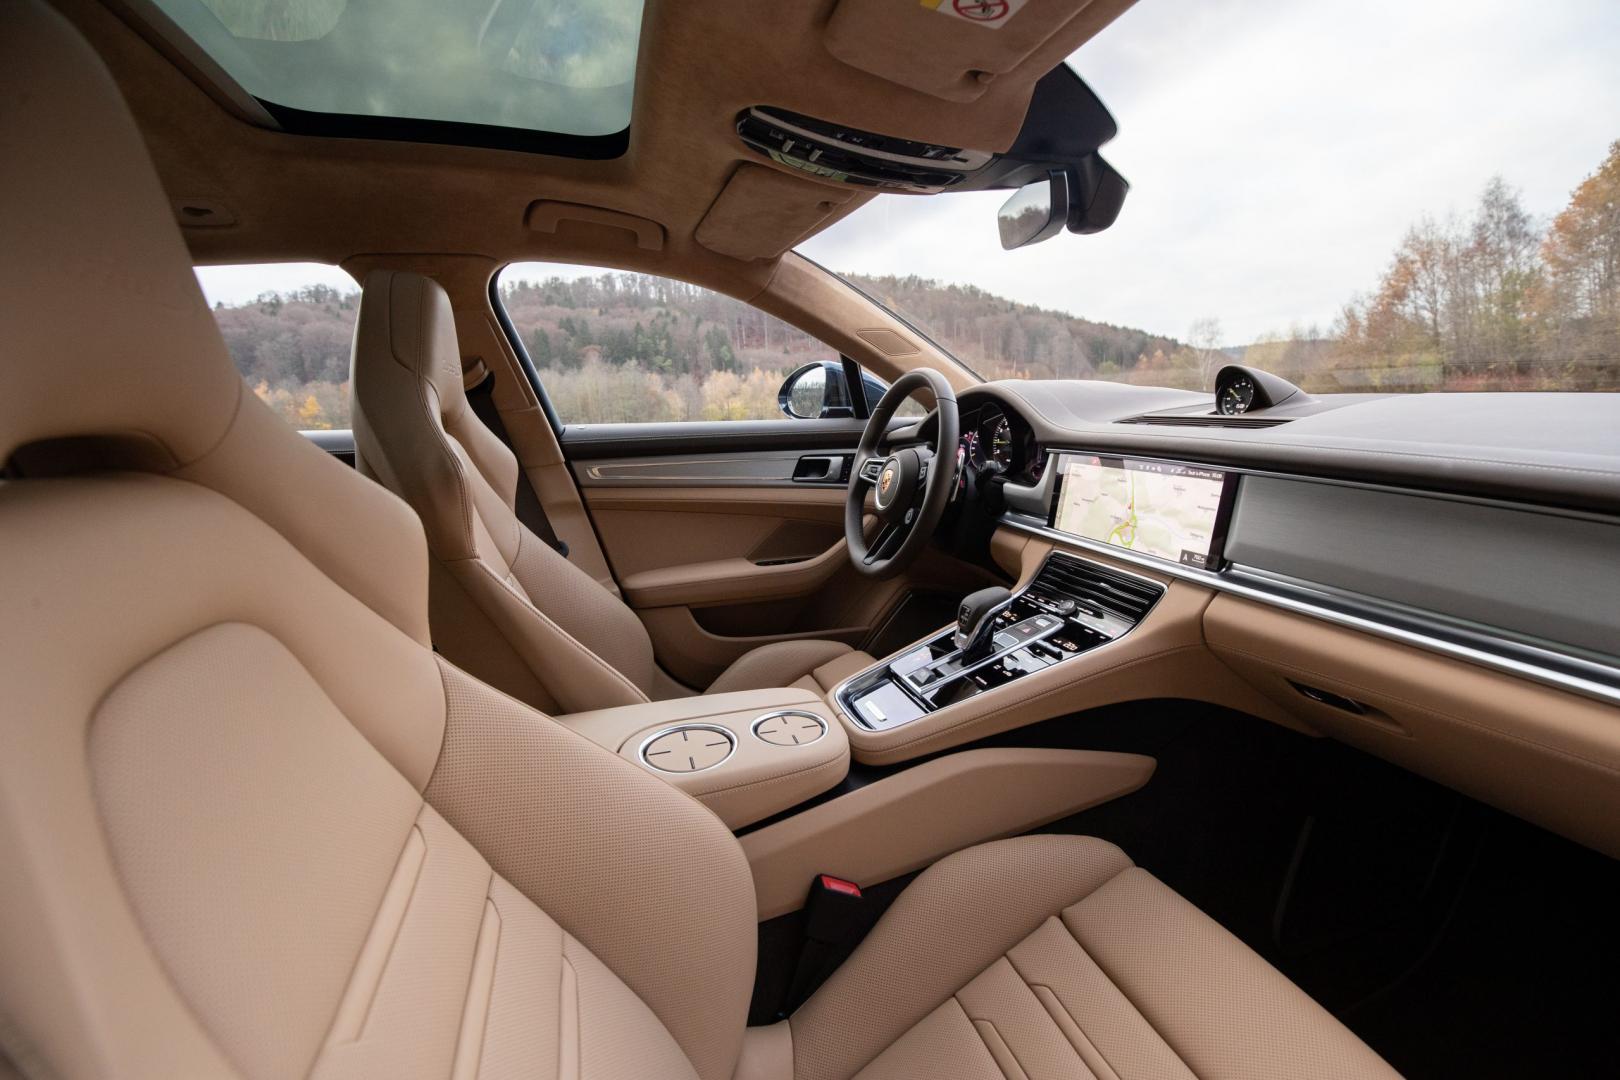 Voorstoelen Porsche Panamera Turbo S E-Hybrid Sport Turismo